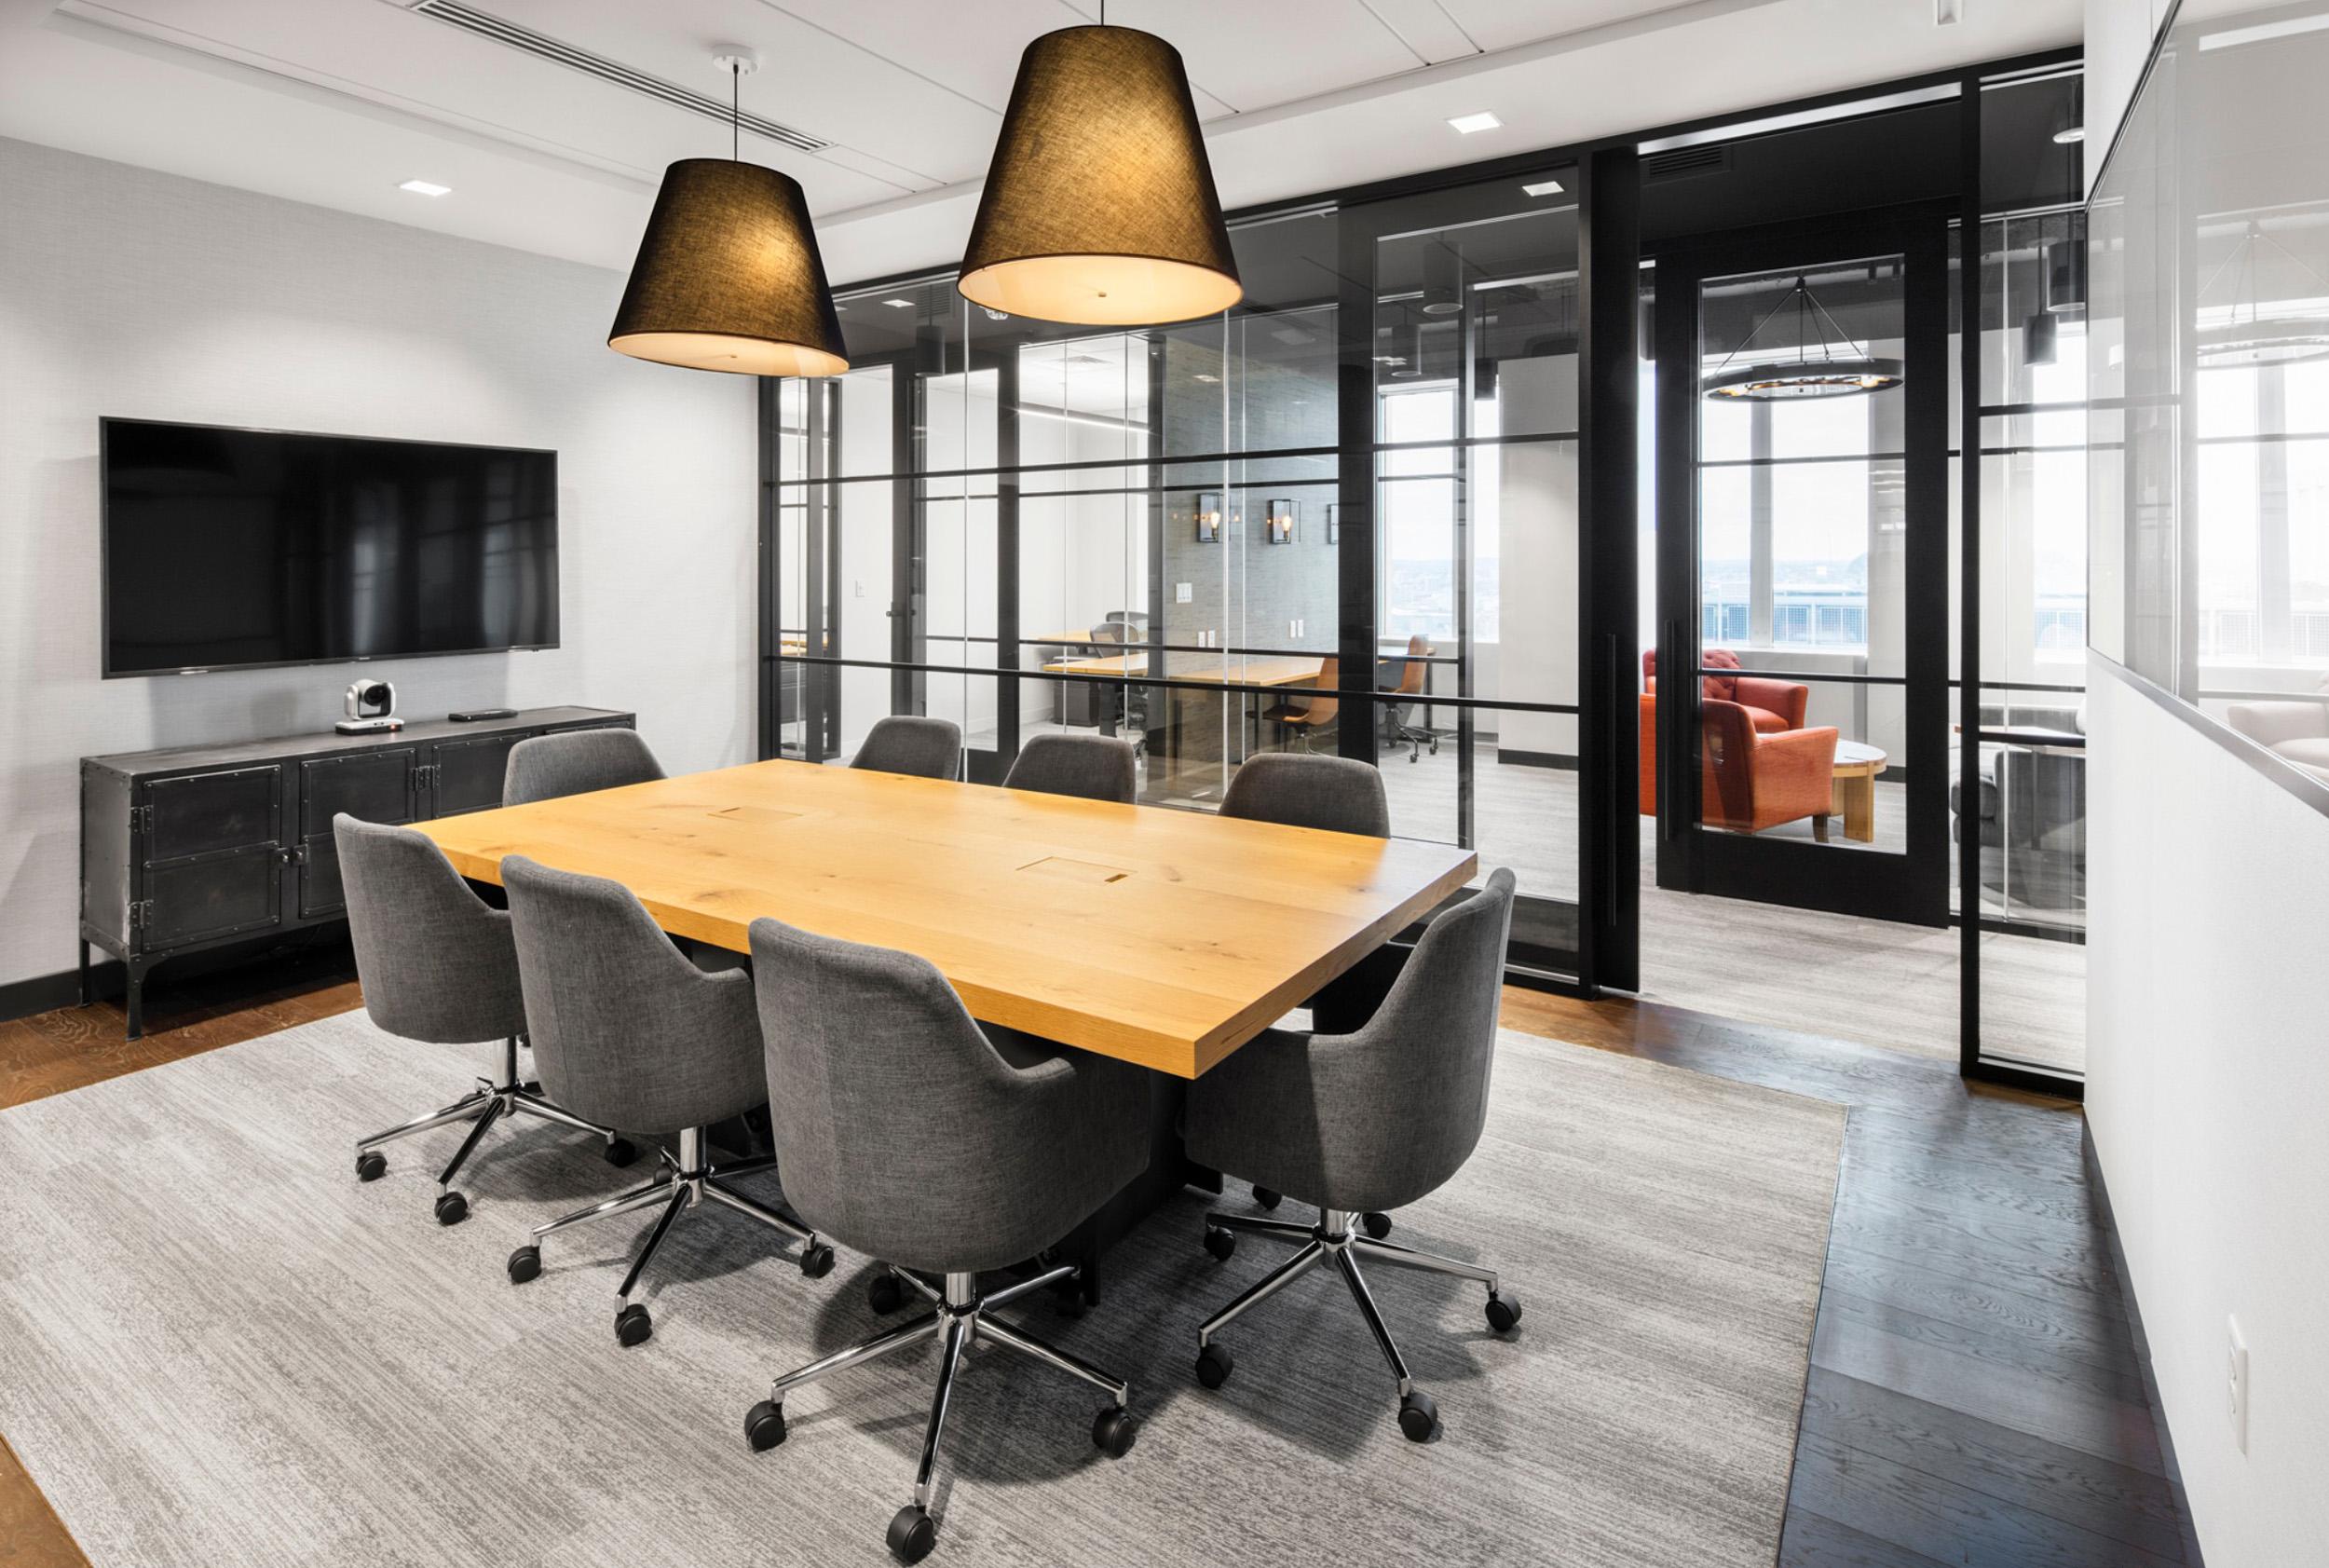 Pacific_Lake_Corderman_Meeting_Room_Construction.jpg